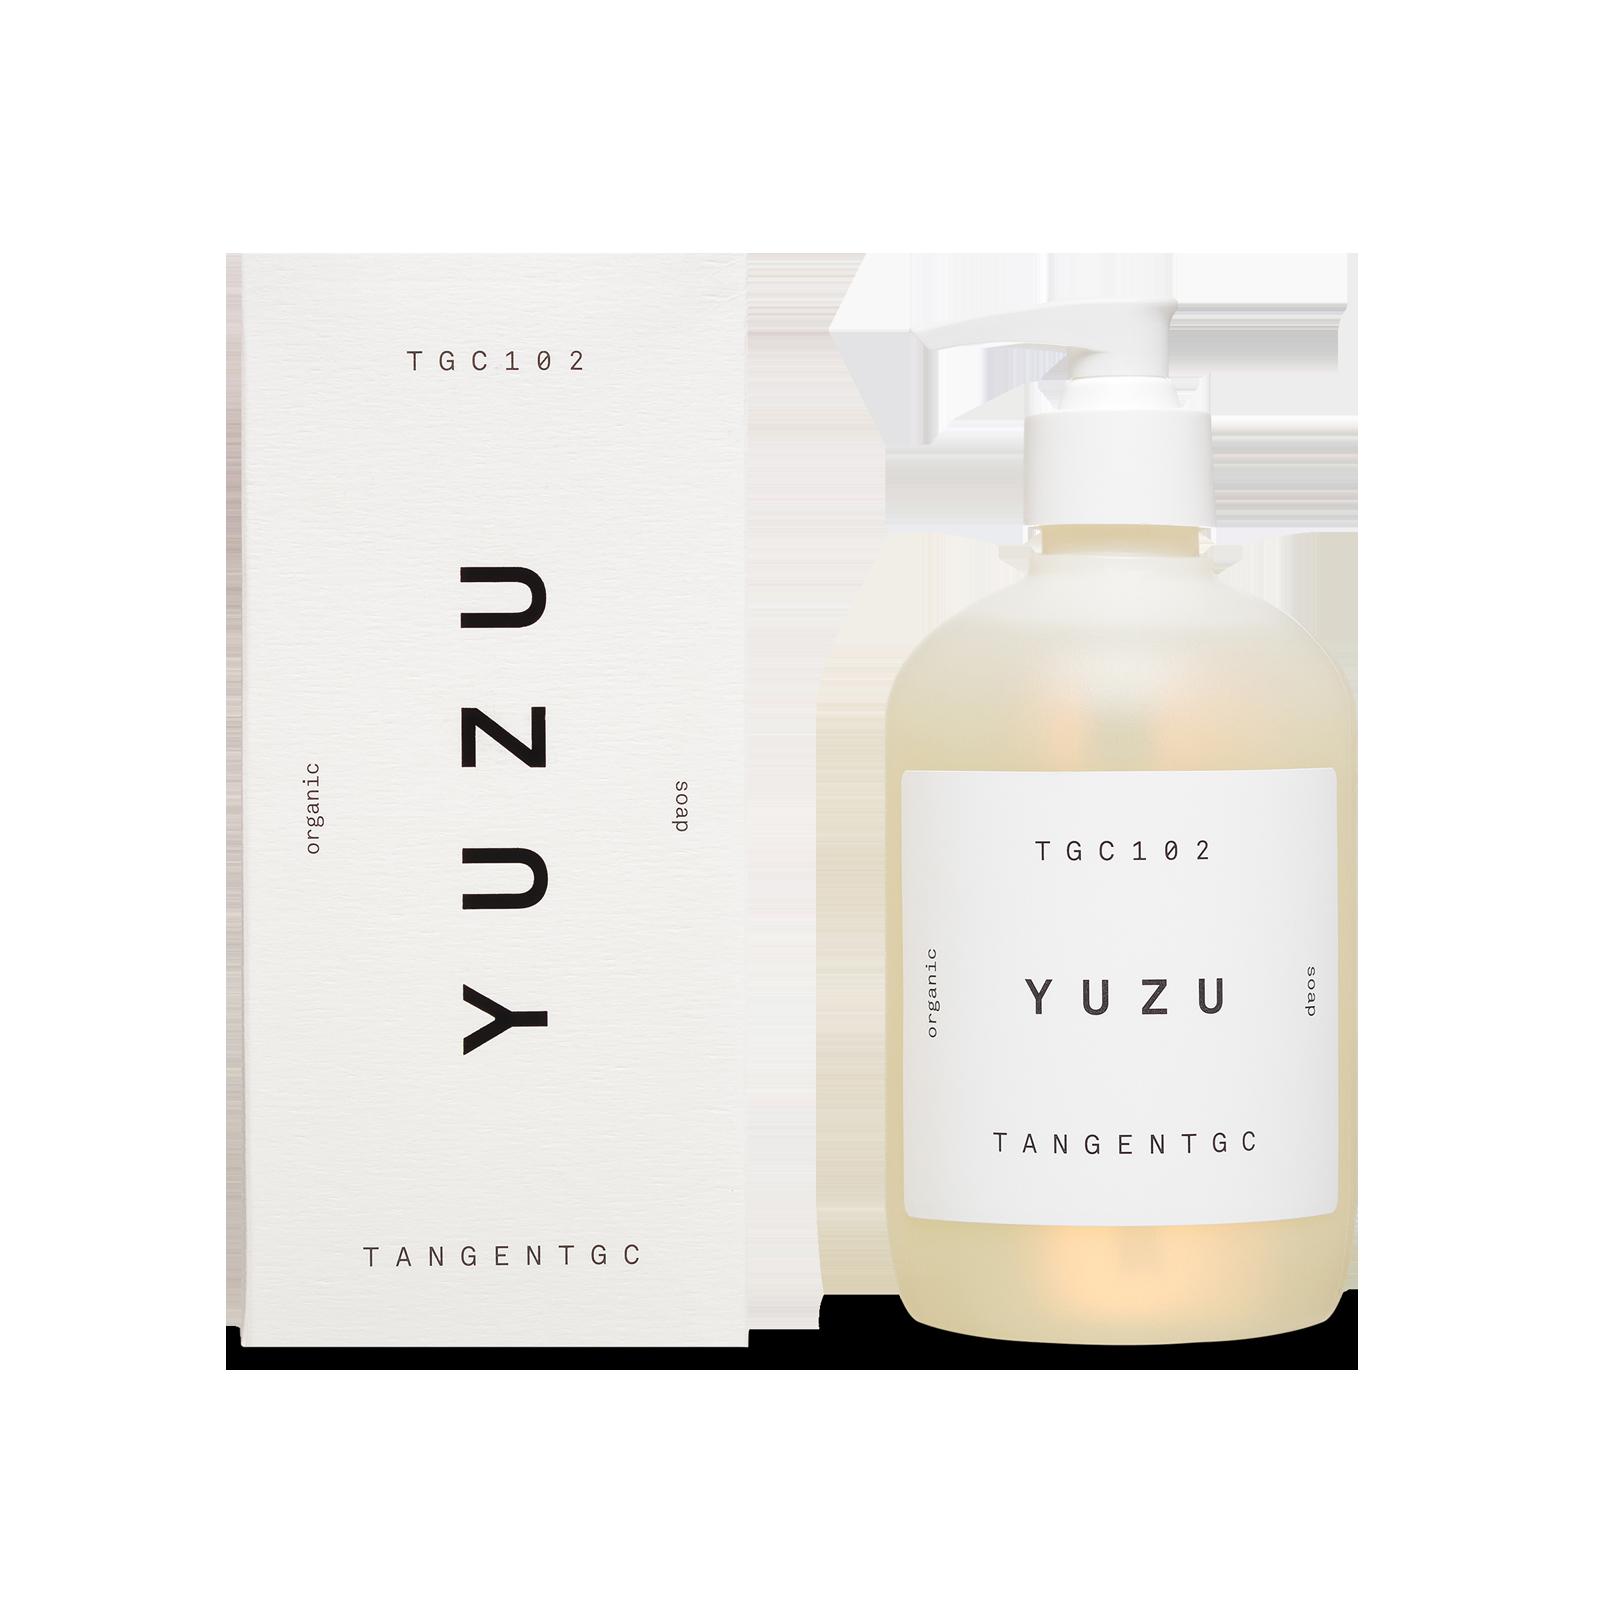 soap bottle product photography